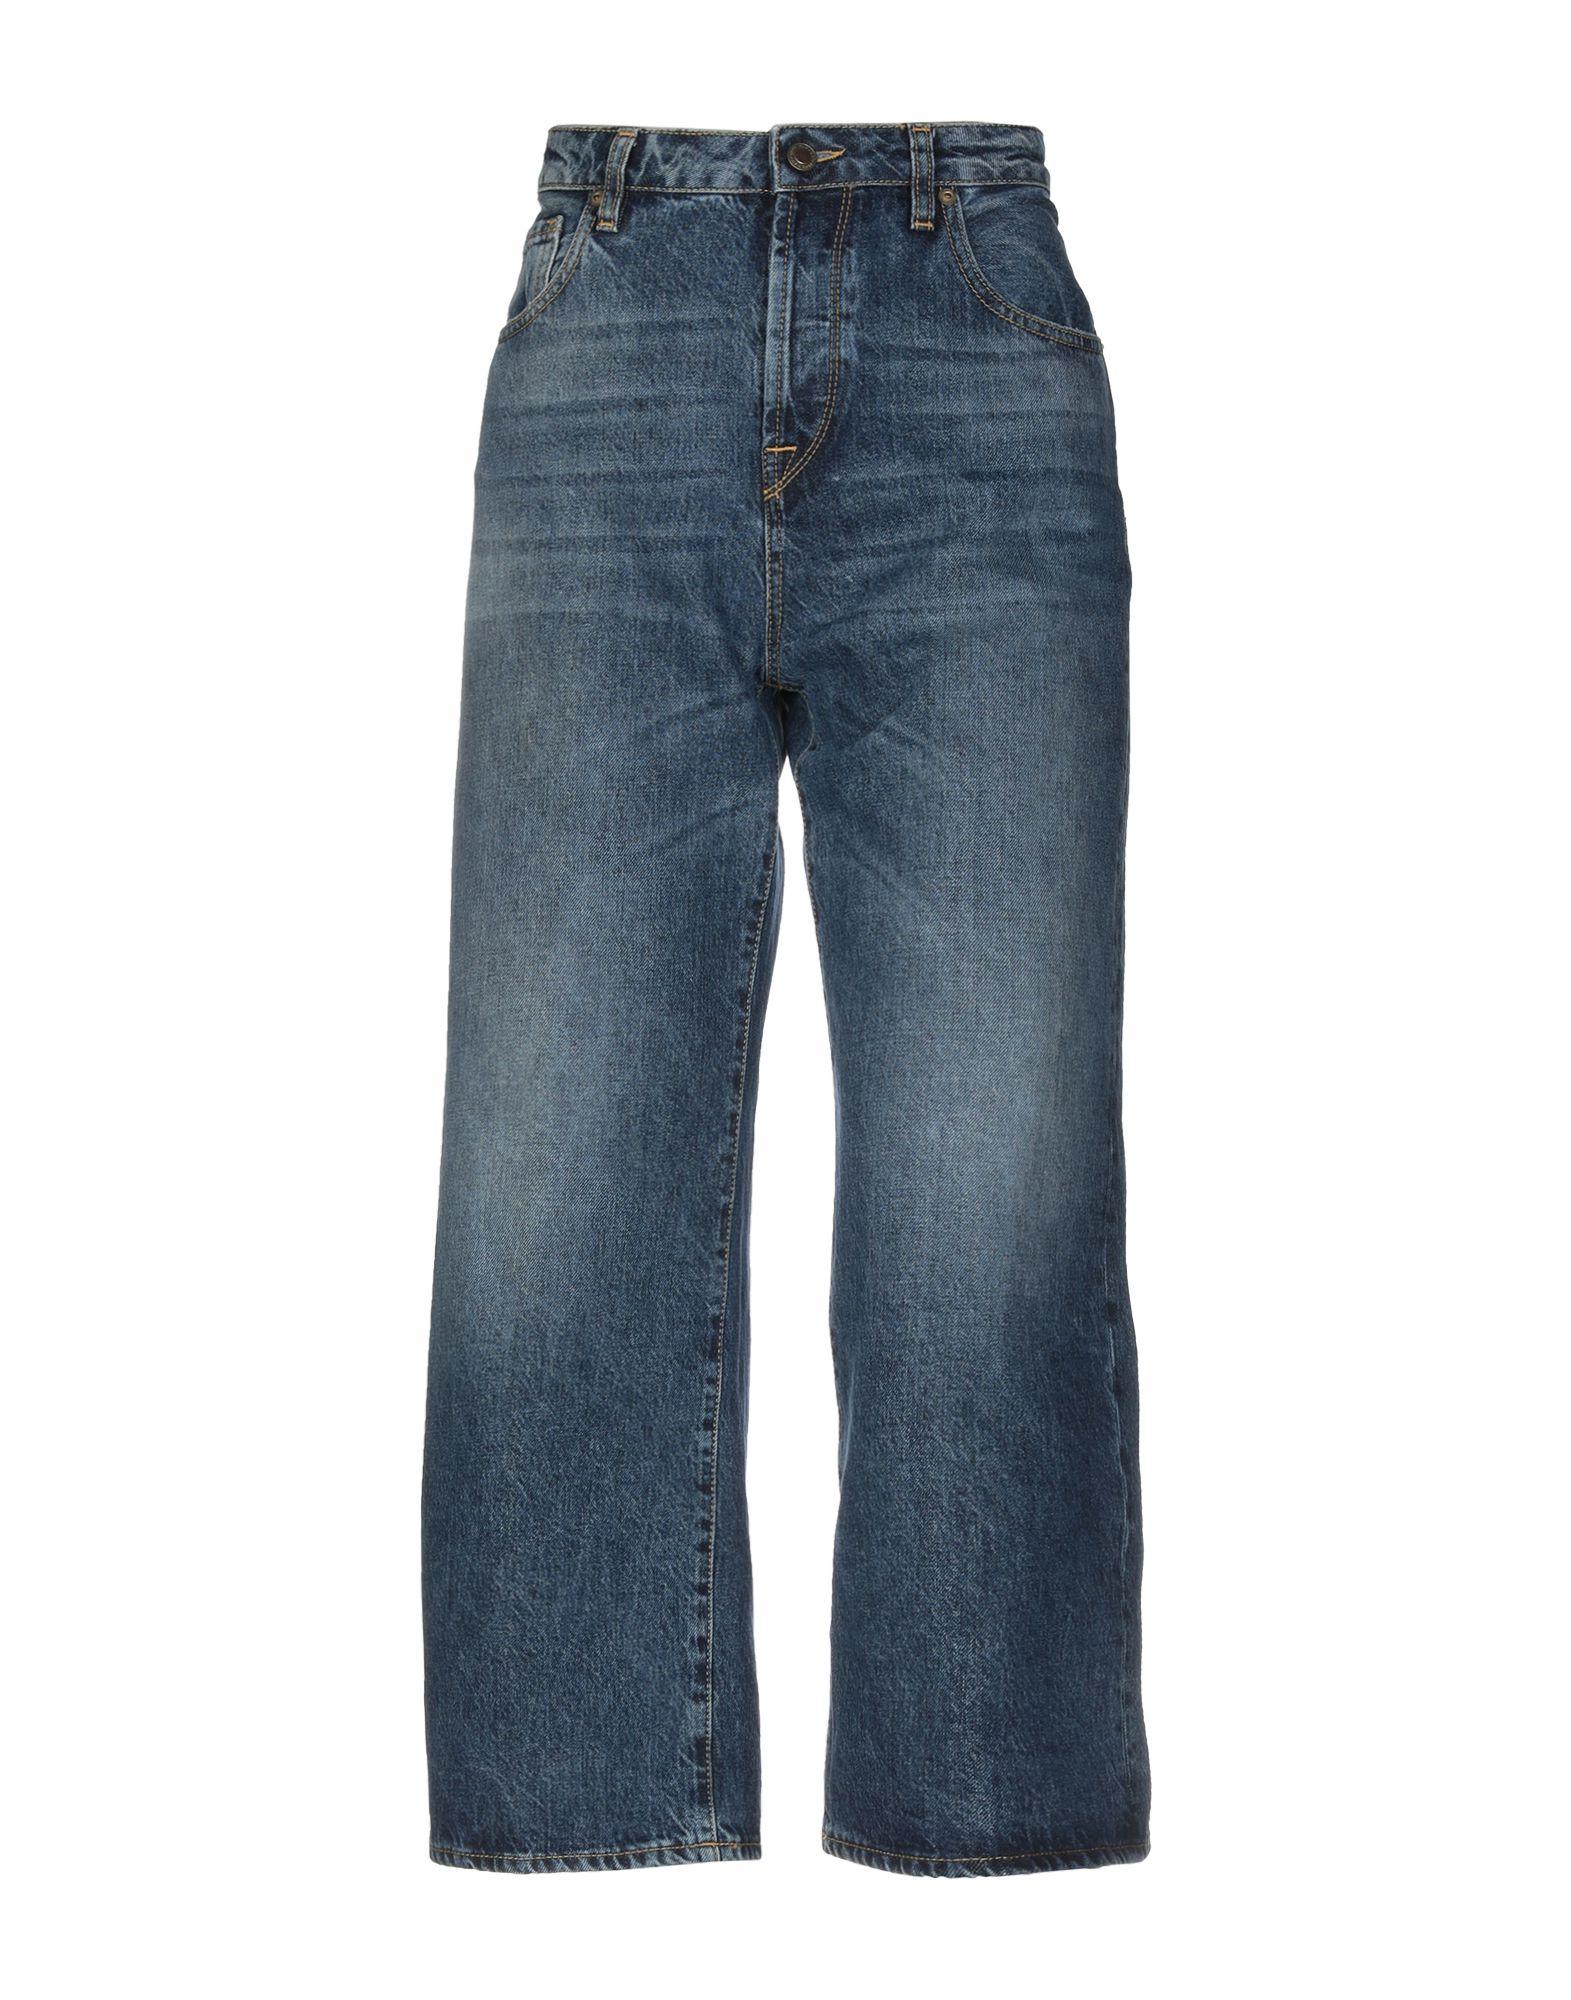 Pantaloni Pantaloni Jeans True Nyc. donna - 42696315XE  am besten kaufen